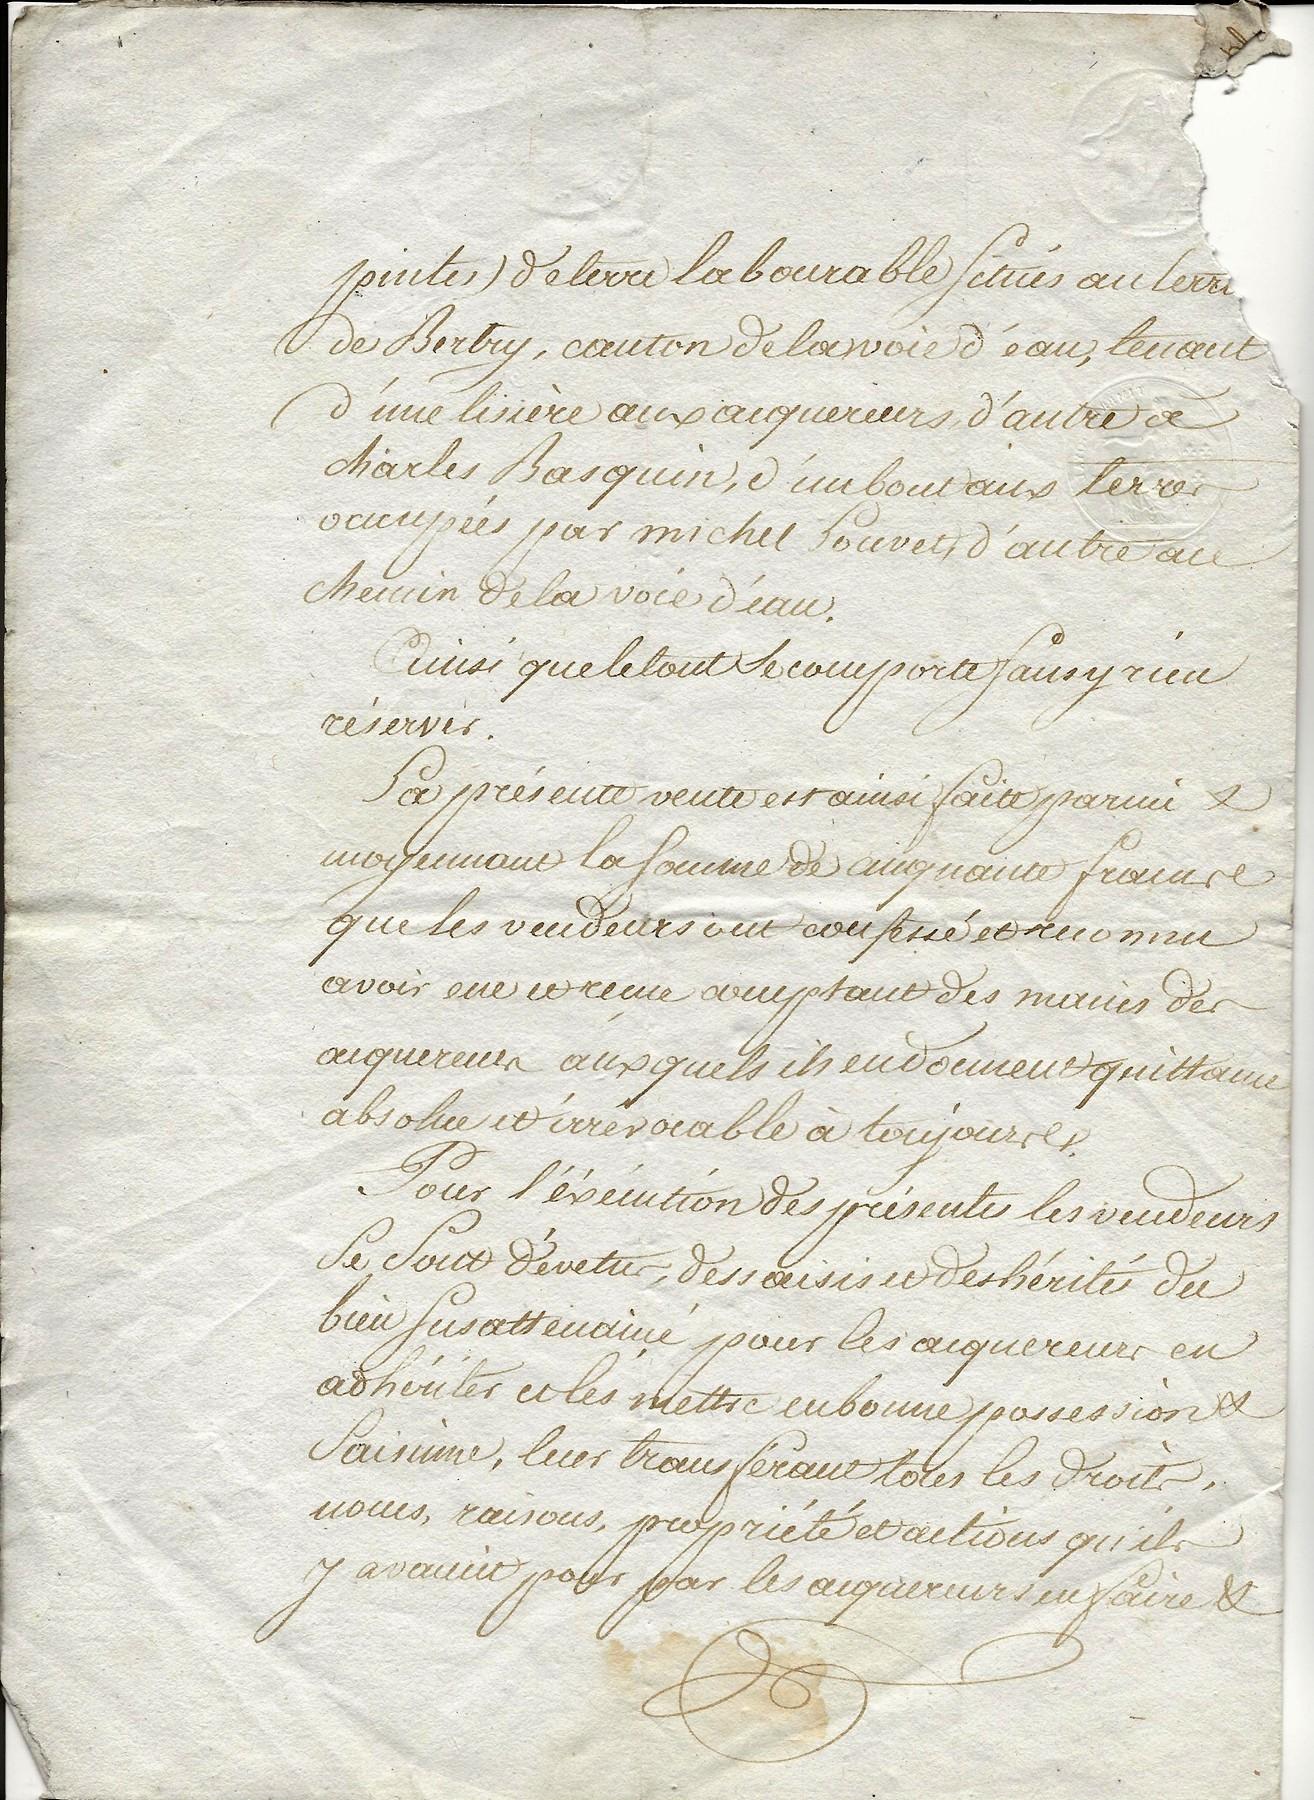 1821 vente herbet a pierre joseph pruvot 002